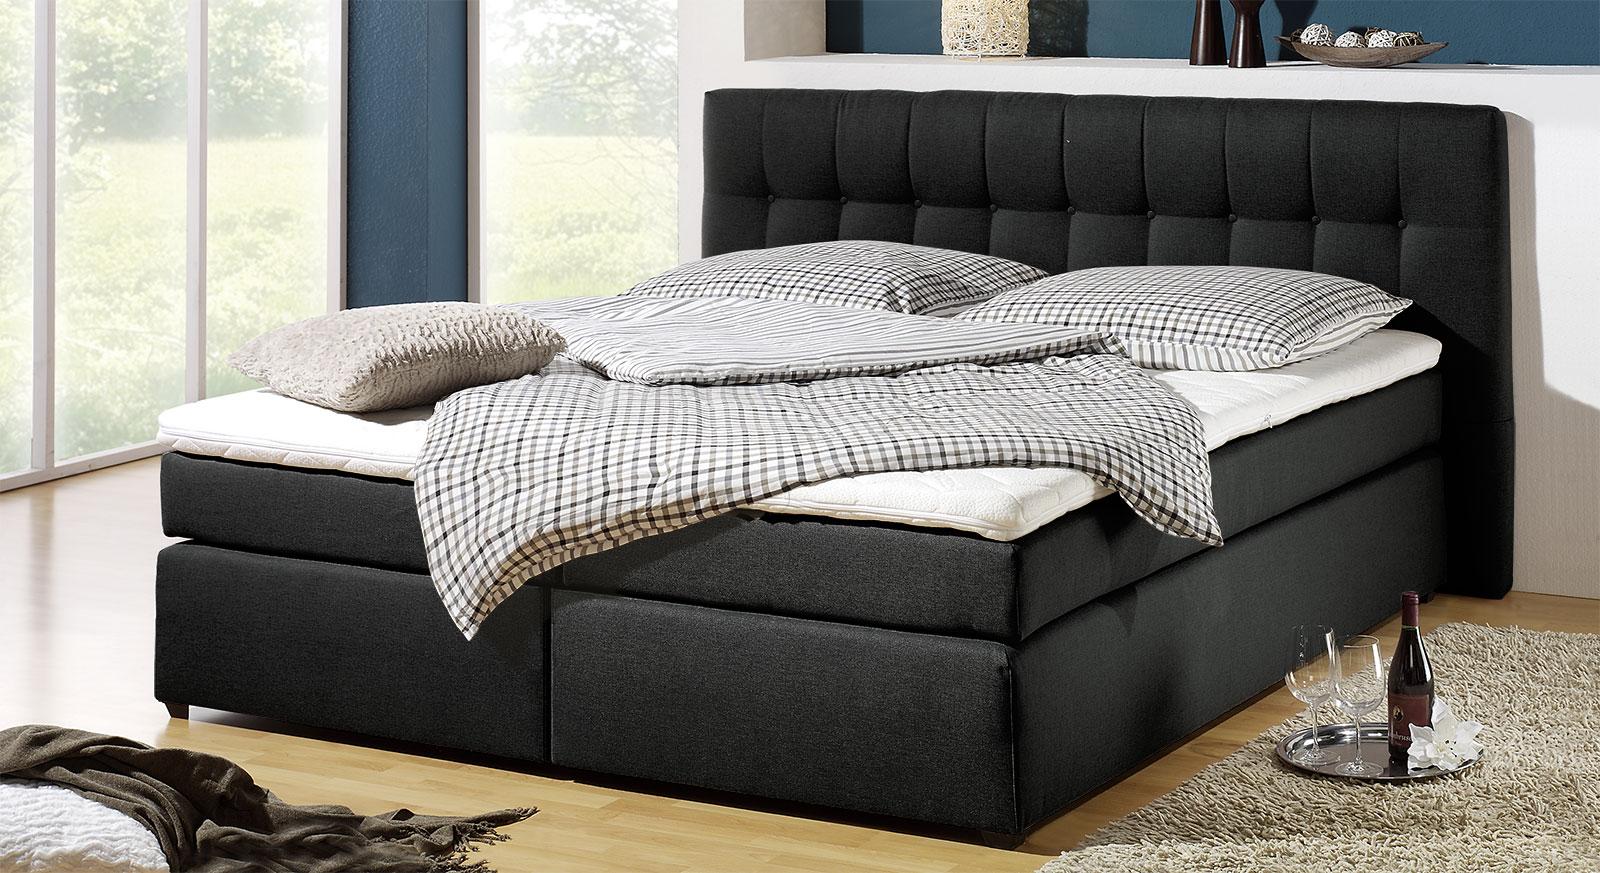 Full Size of Boxspringbett In H3 Bis 120kg Krpergewicht Chicago Bettende Bett Betten.de